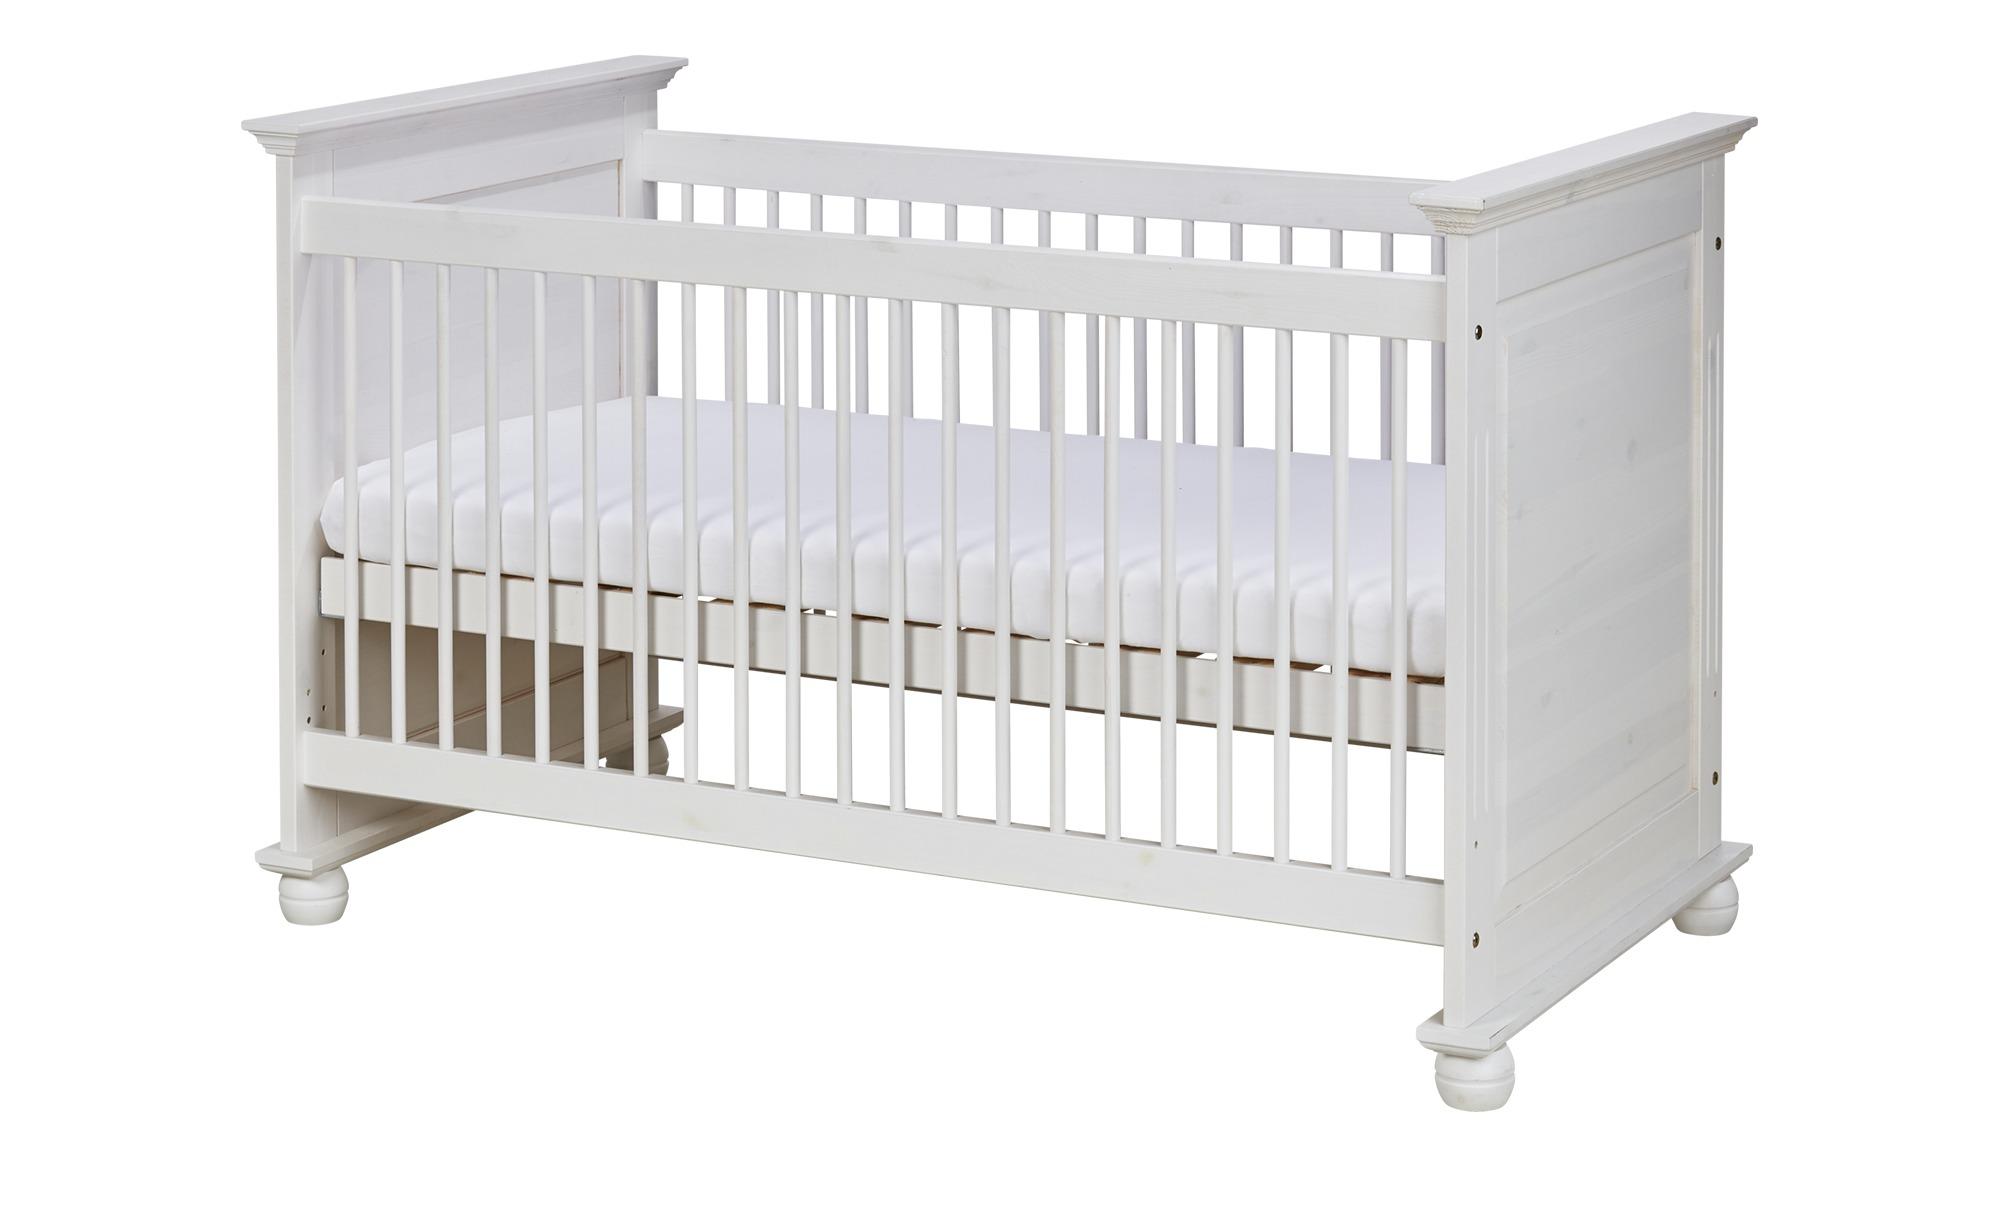 Massivholz-Babybett - weiß - 85 cm - 93 cm - 85 cm - Baby > Babymöbel > Babybetten - Möbel Kraft